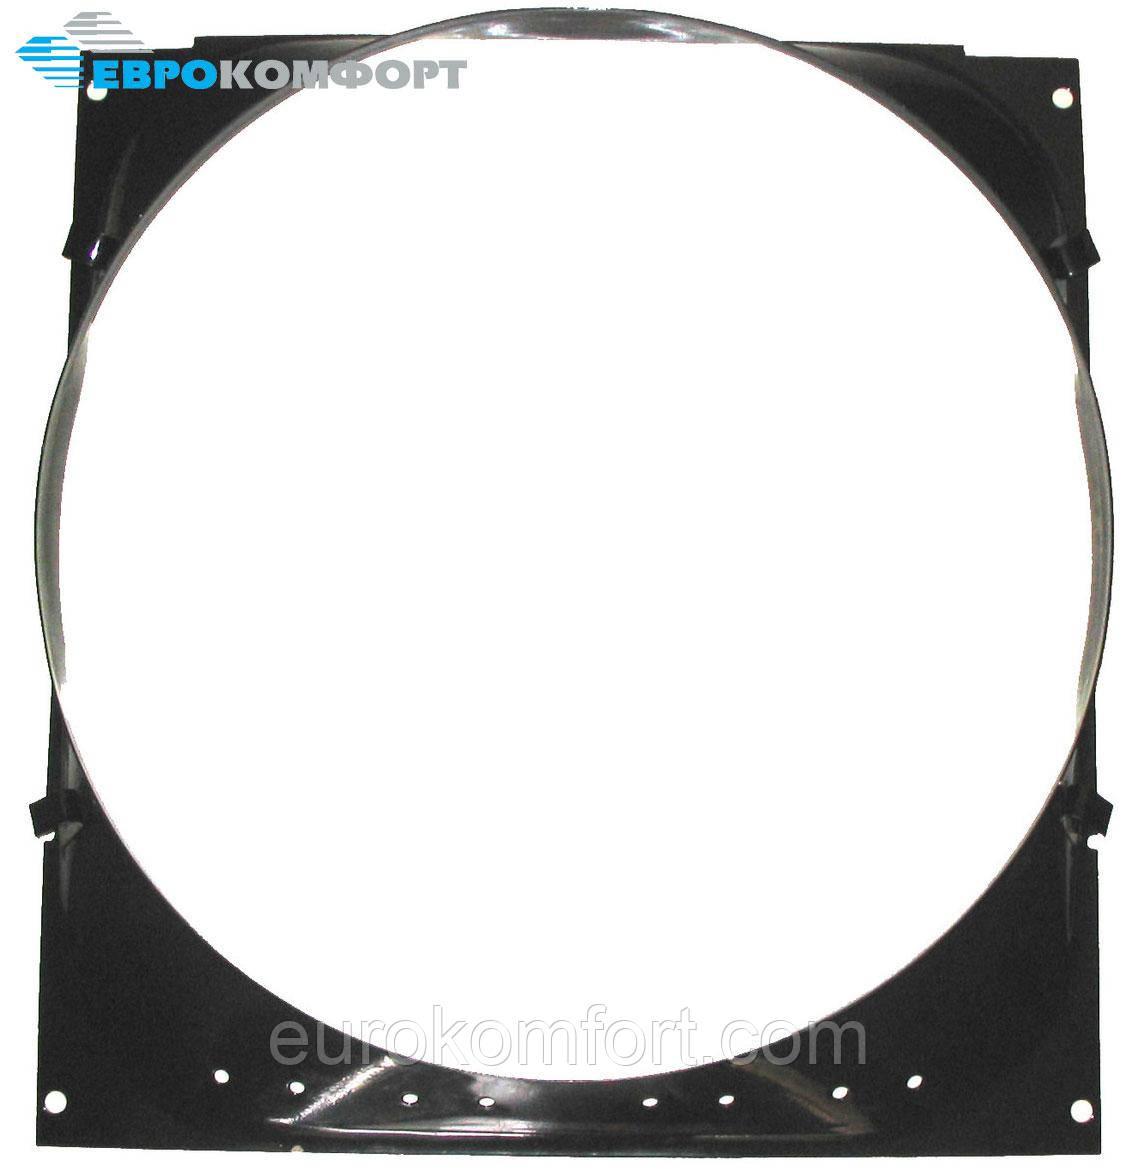 Кожух радиатора (диффузор) 70-1309080 (МТЗ, Д-240)